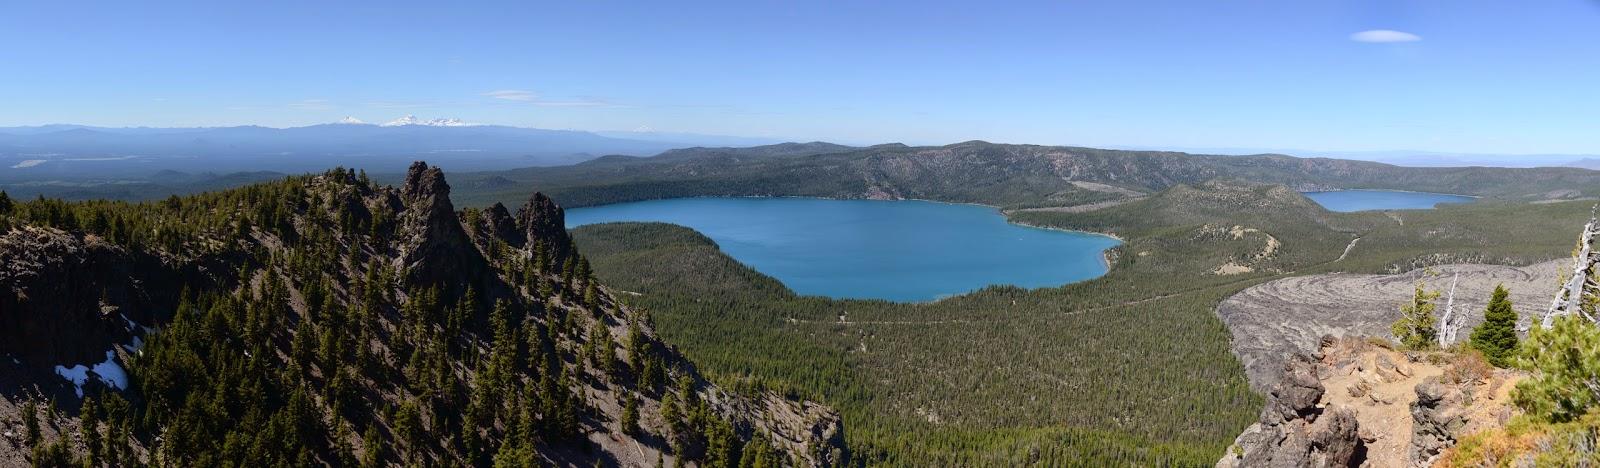 From Paulina Peak - Deschutes National Forest - Oregon